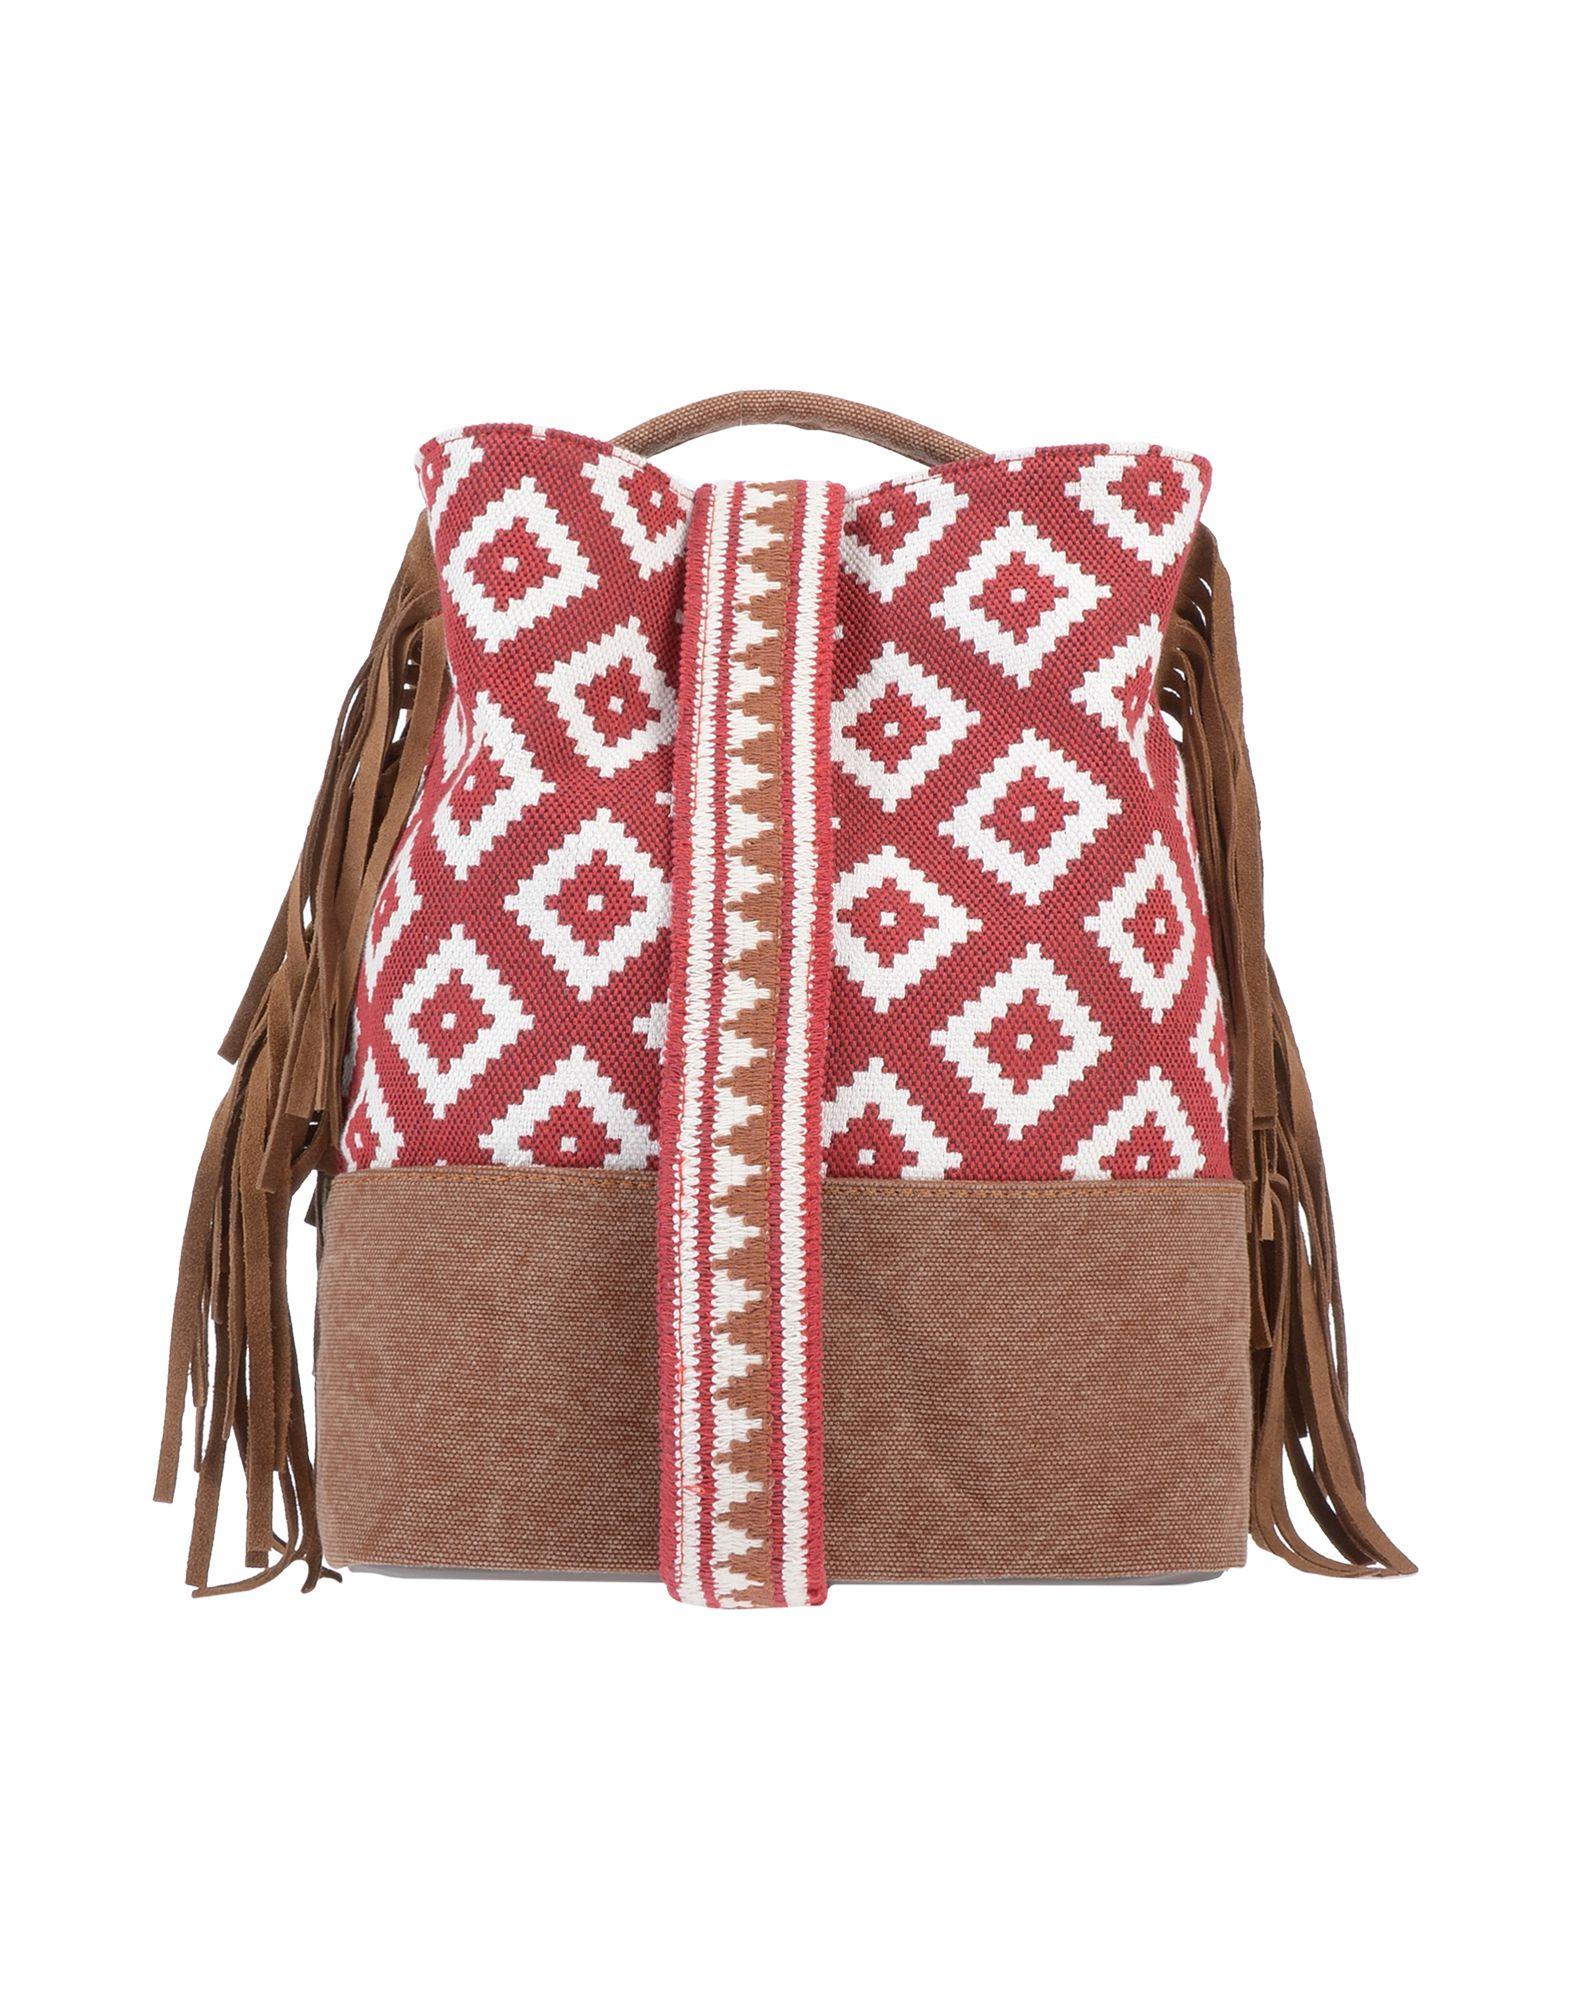 Фото - VIA MAIL BAG Сумка на руку sy16 black professional waterproof outdoor bag backpack dslr slr camera bag case for nikon canon sony pentax fuji